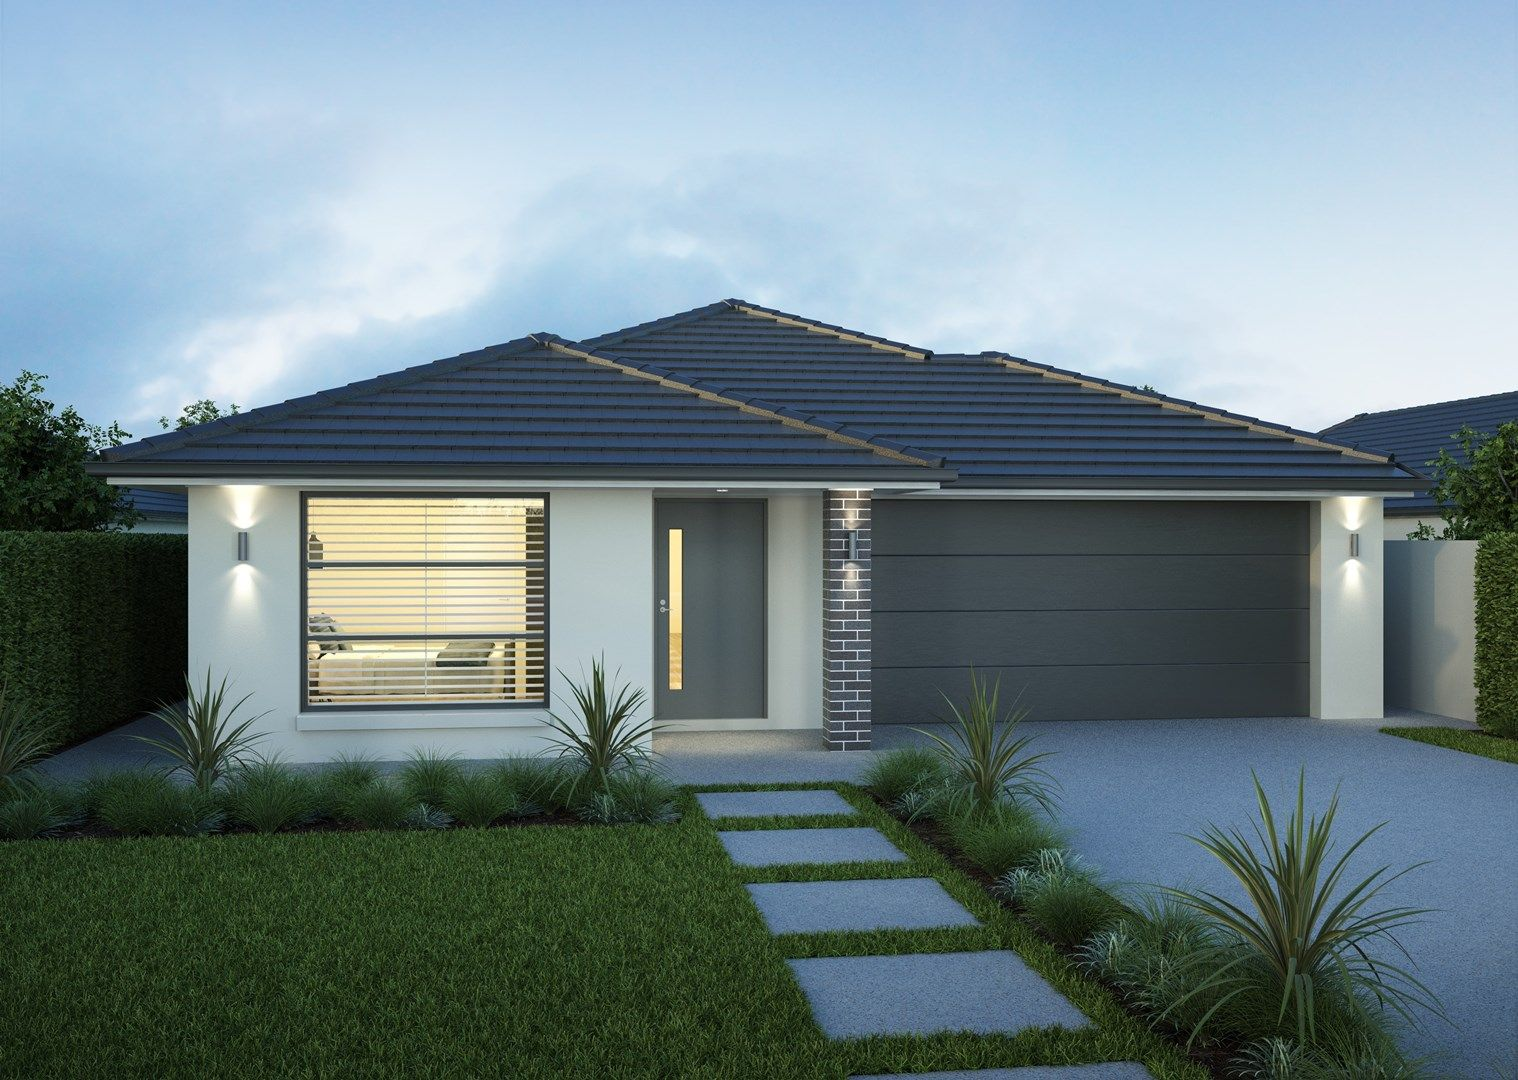 20 Australia II Drive, Kensington Grove QLD 4341, Image 0